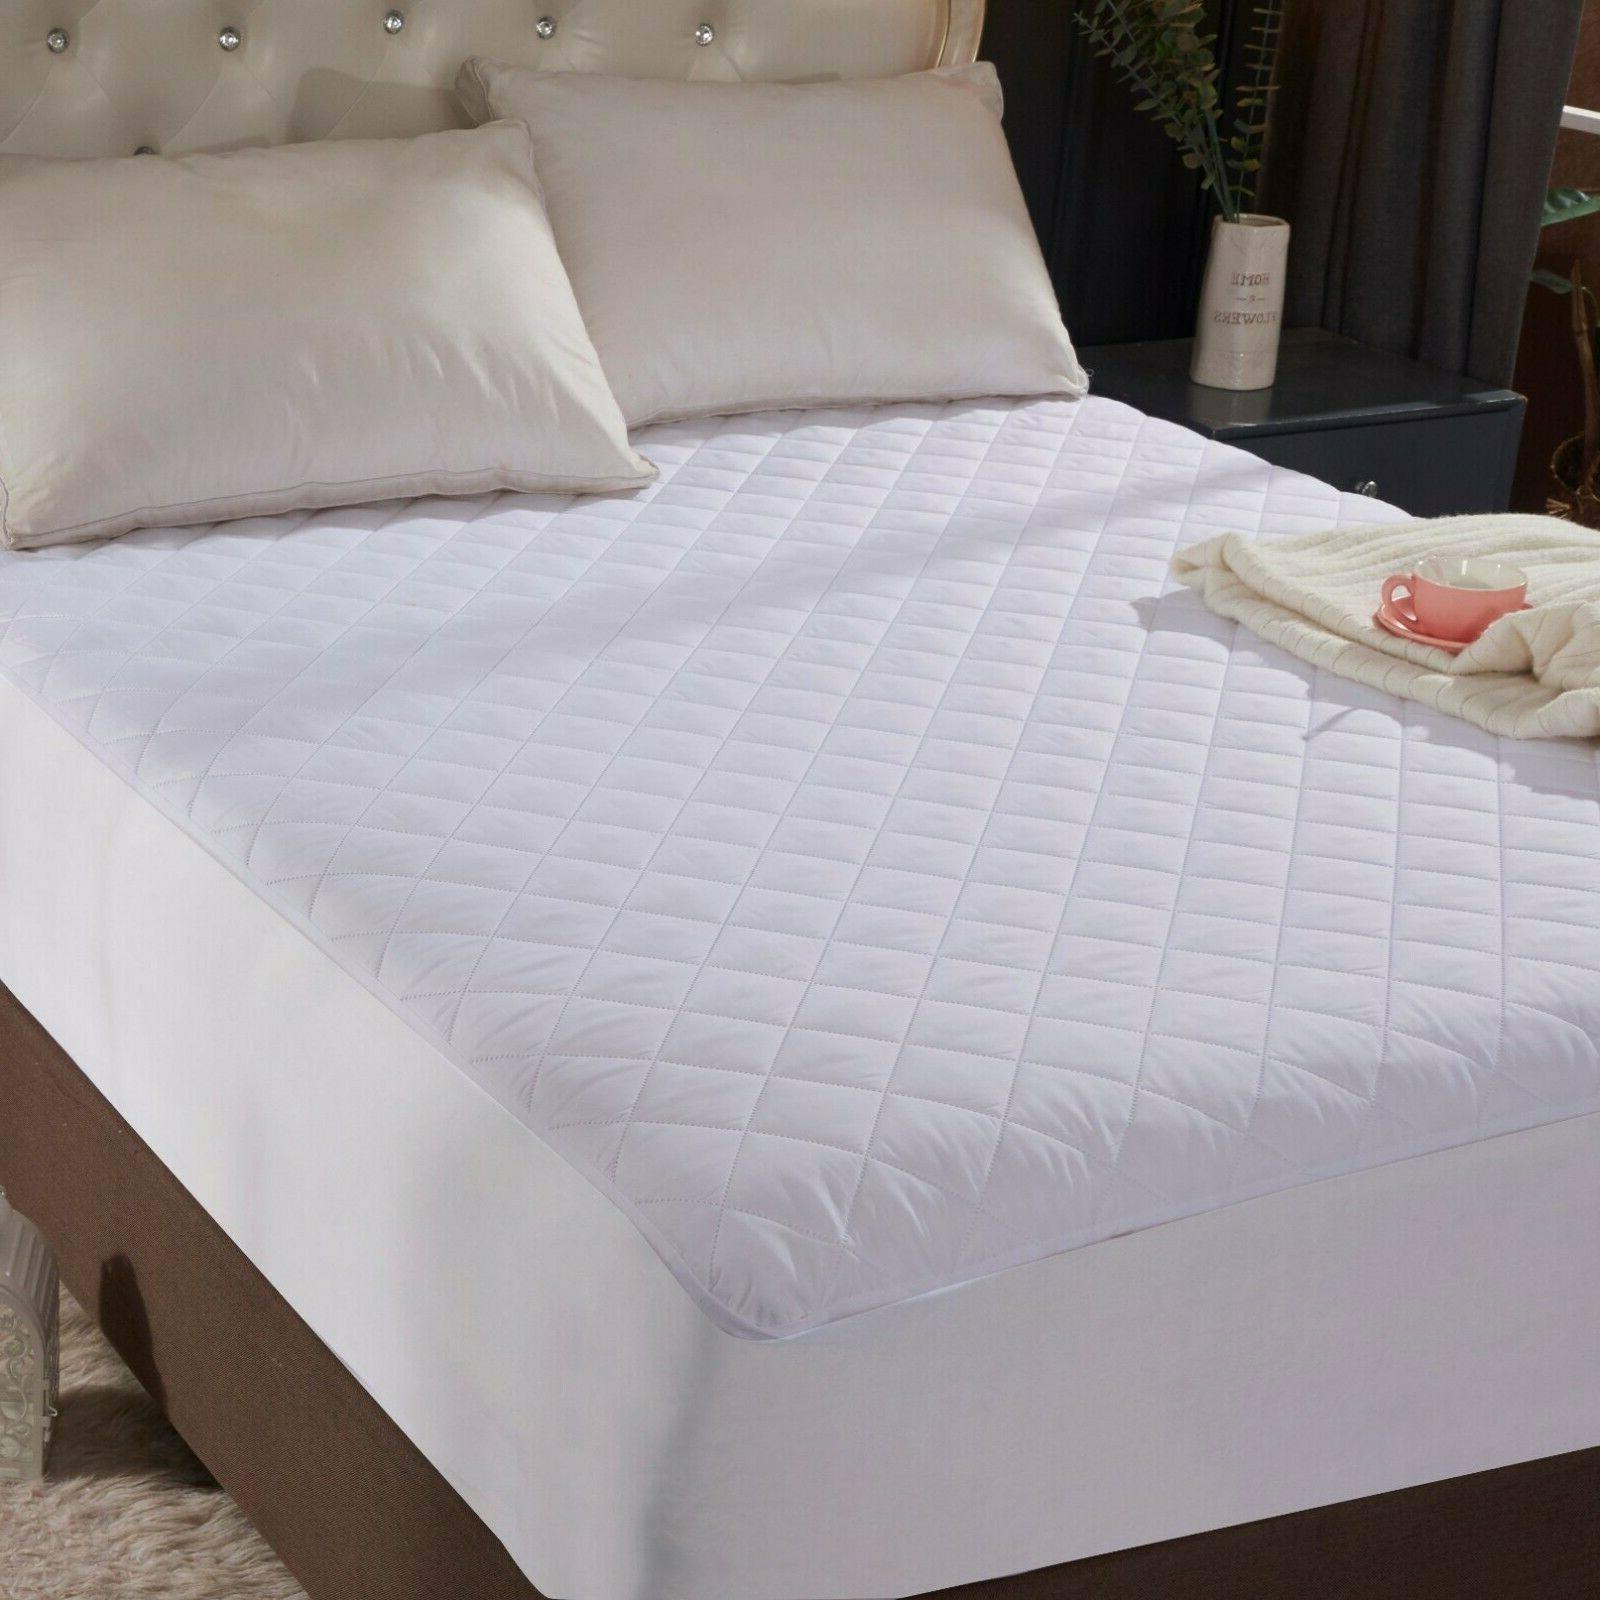 "Queen Quilted Mattress Protector Topper 16"" Deep Bed Sheet"